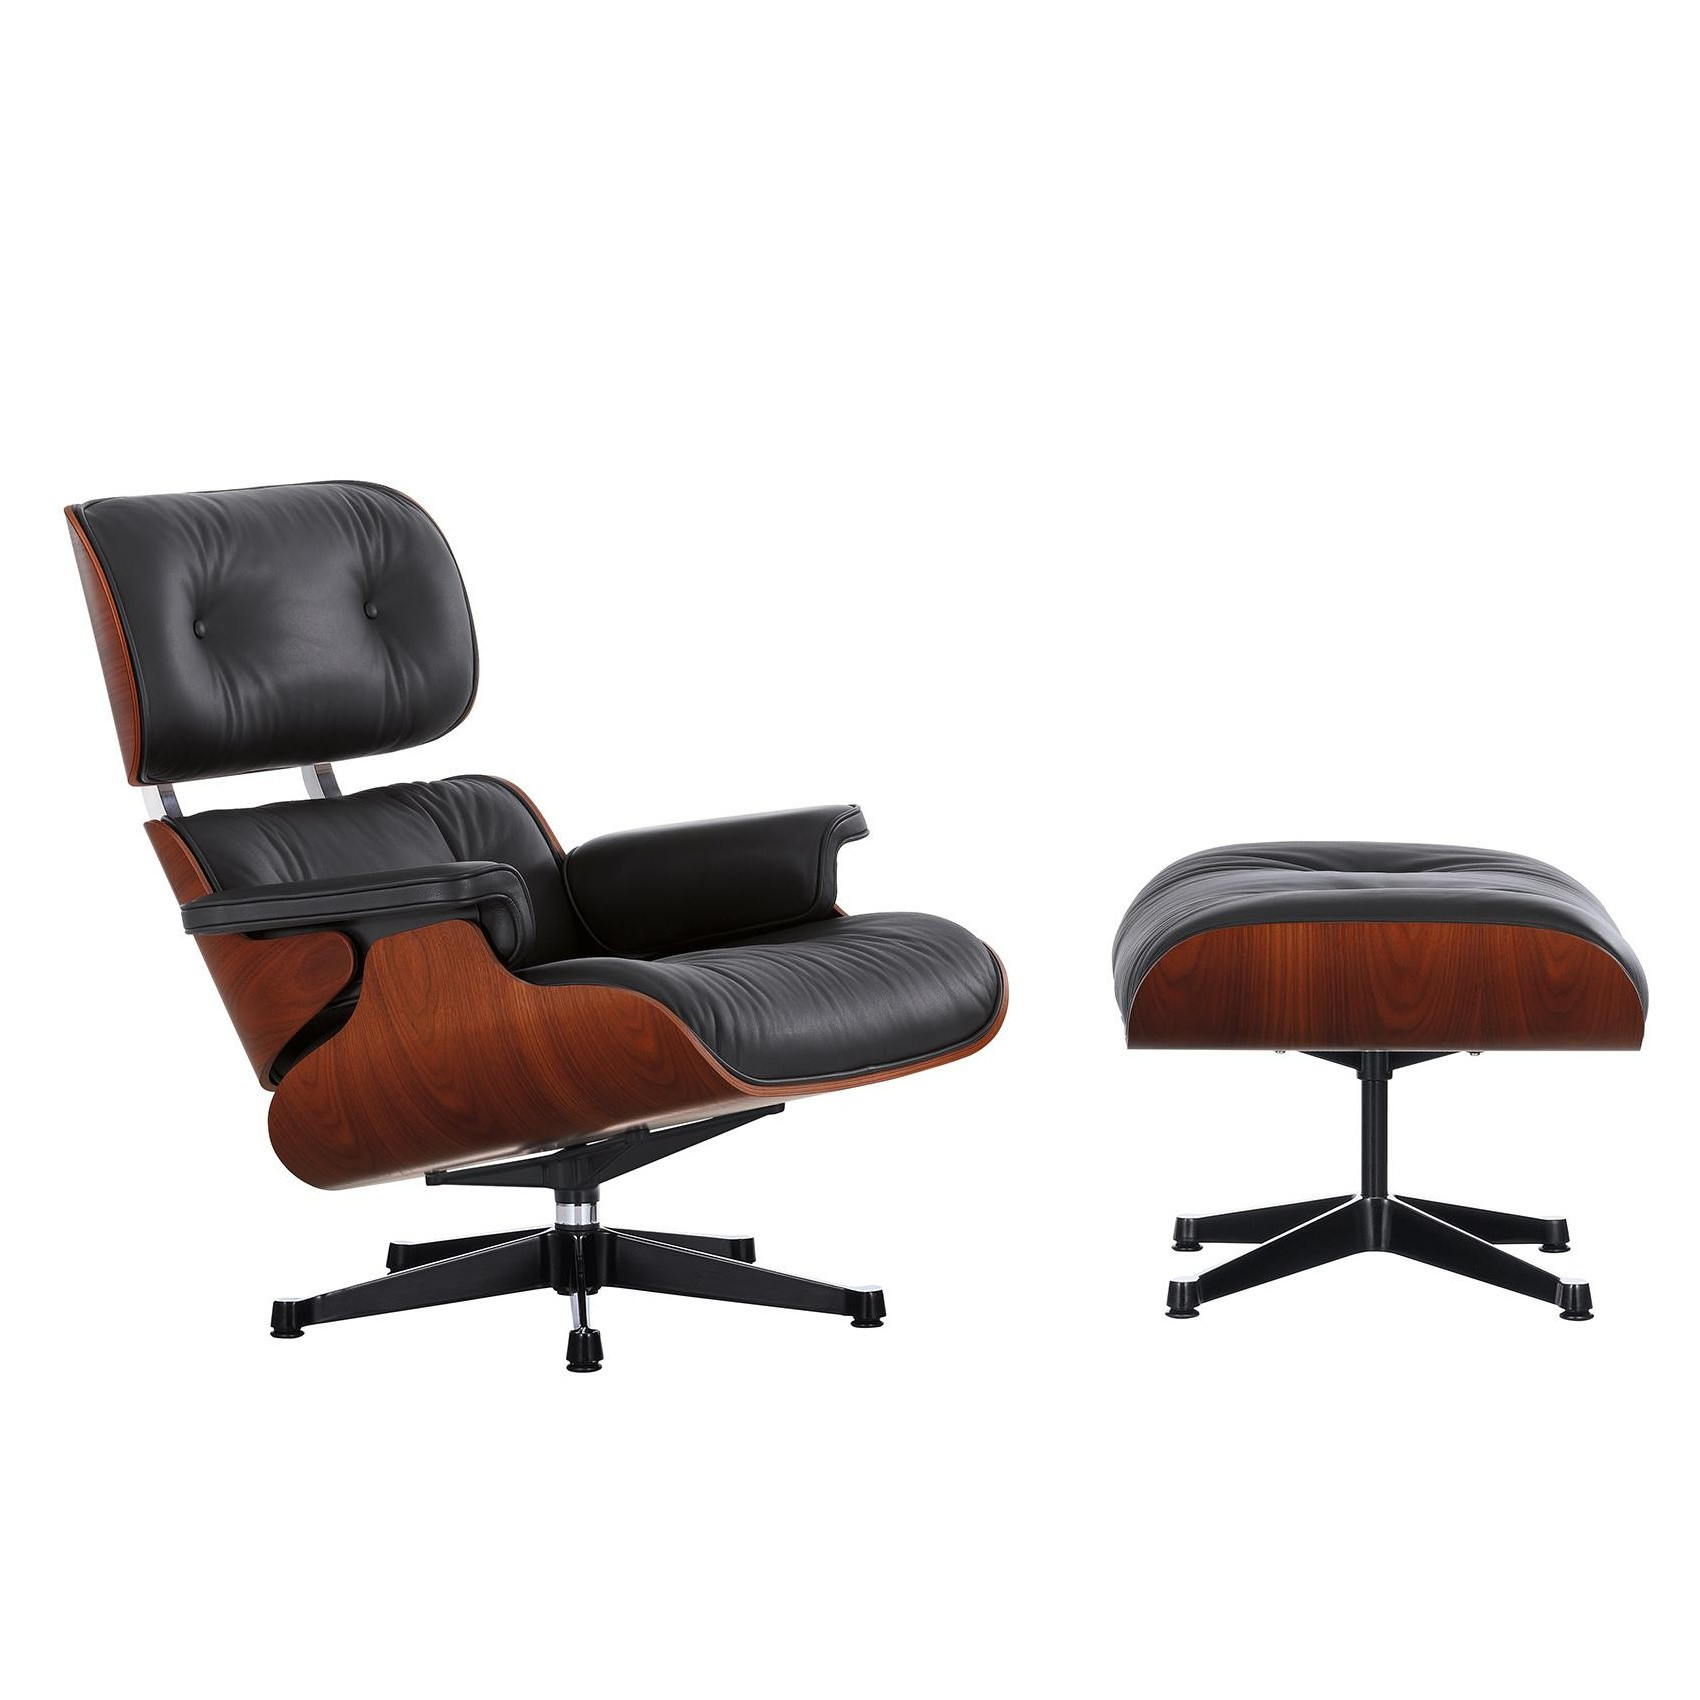 Vitra Eames Lounge Chair Set LTR Gratis